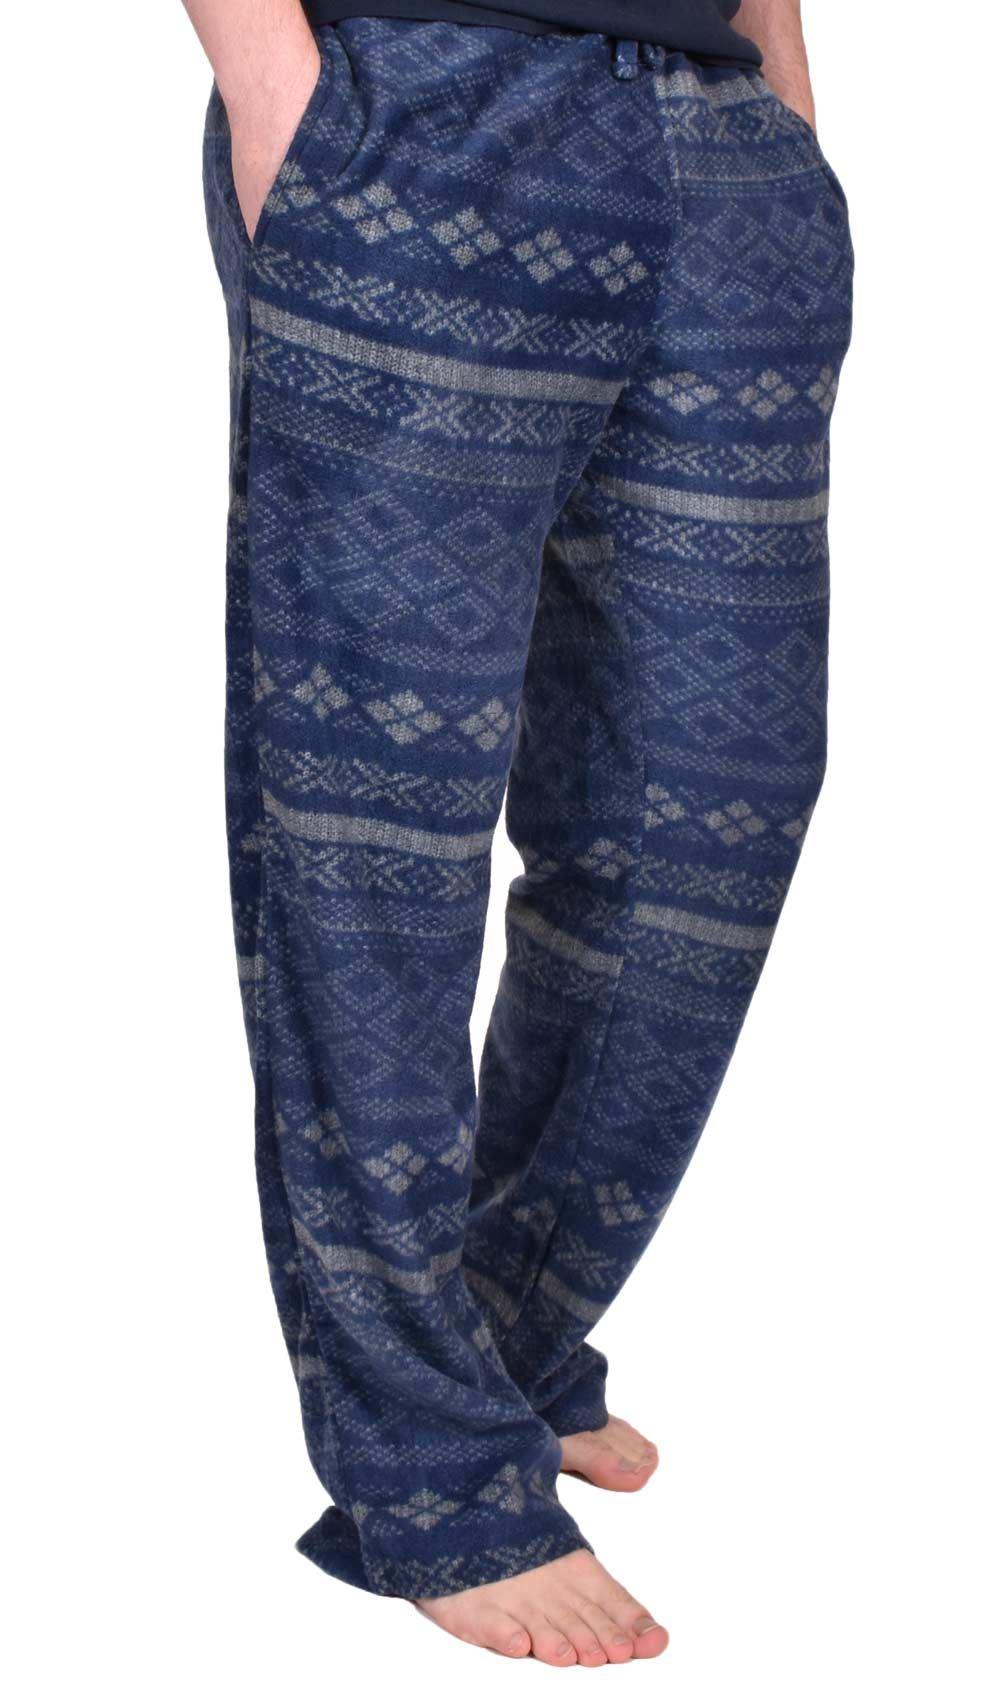 Mens-Women-Plain-Fleece-Joggers-Bottoms-Jogging-Pant-Gym-Fitness-Sports-Trousers thumbnail 15